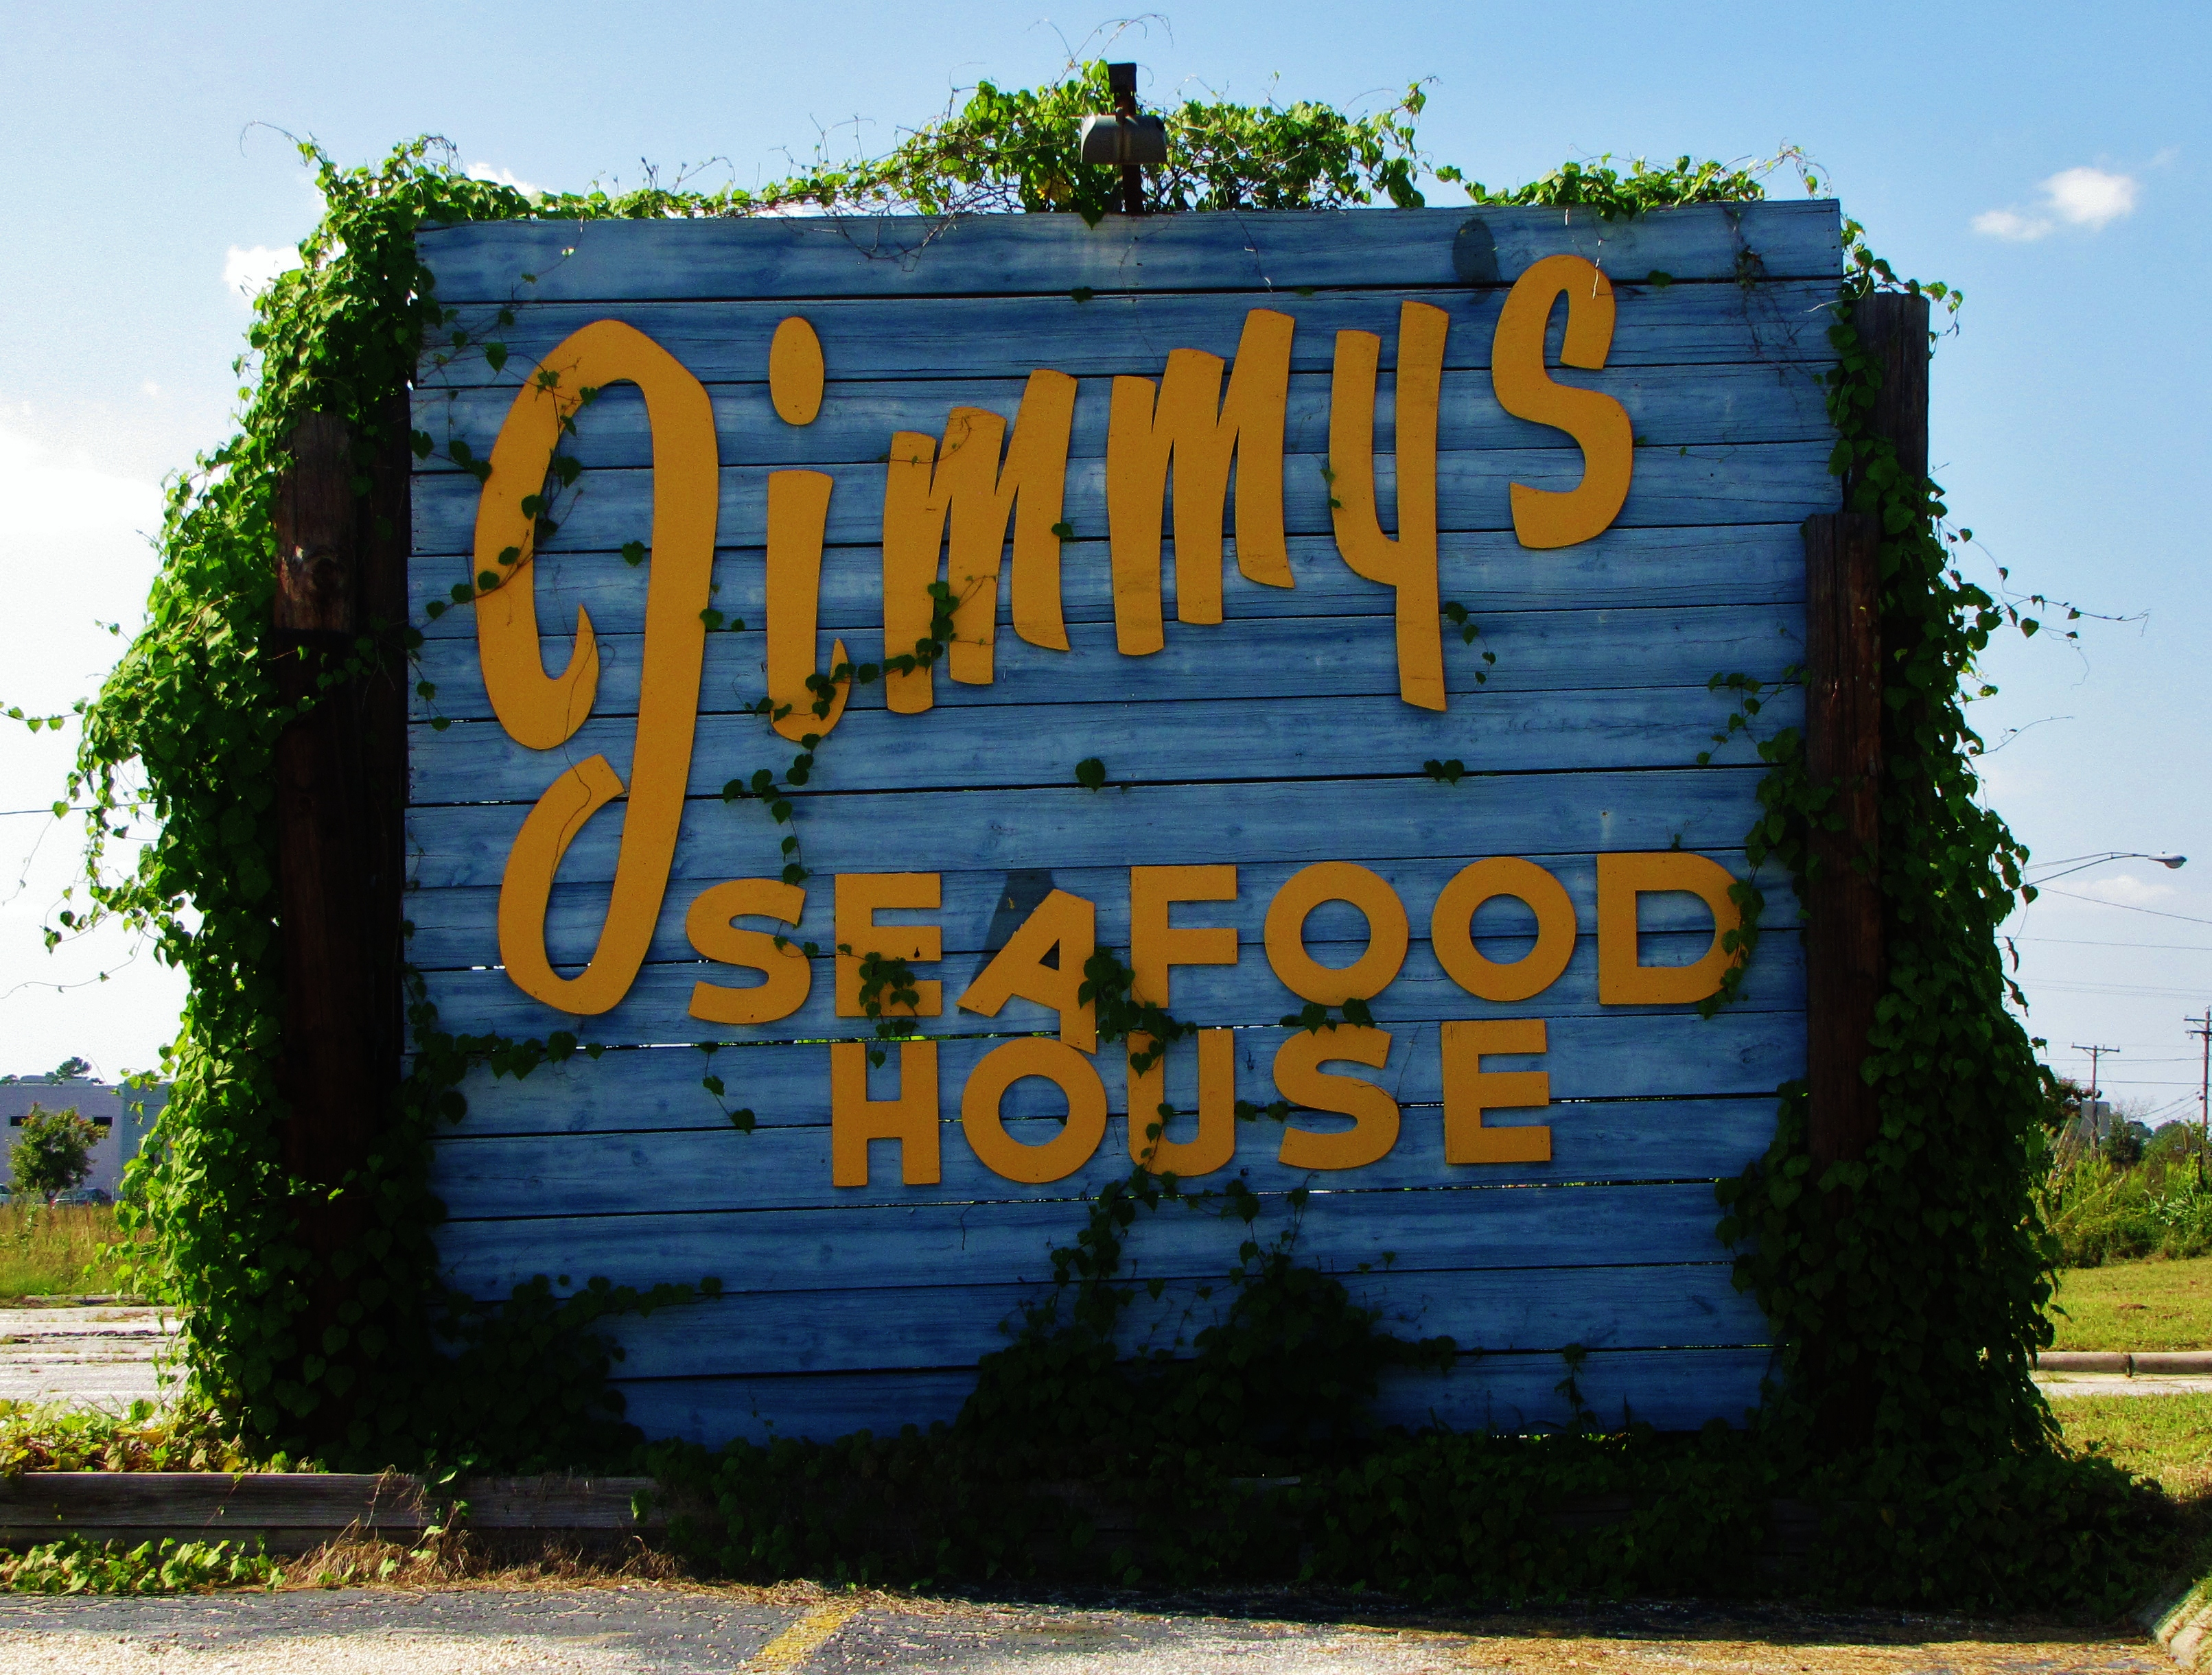 Jimmy's Seafood House - 1933 North Roberts Avenue, Lumberton, North Carolina U.S.A. - September 4, 2017